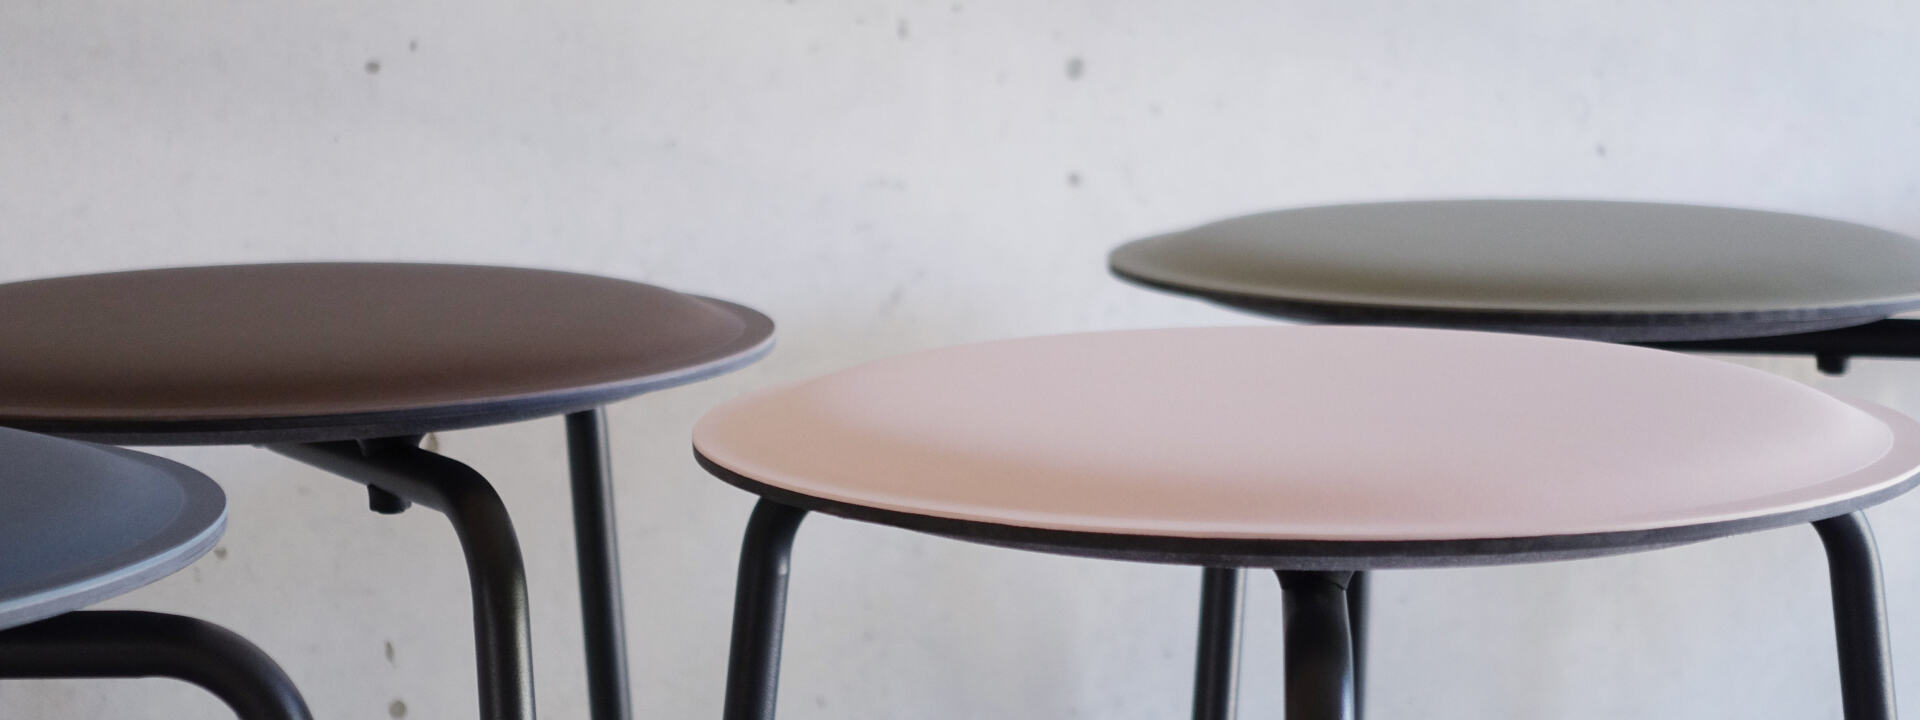 Ravioli Linoleum Stool S, Chairs & Stools